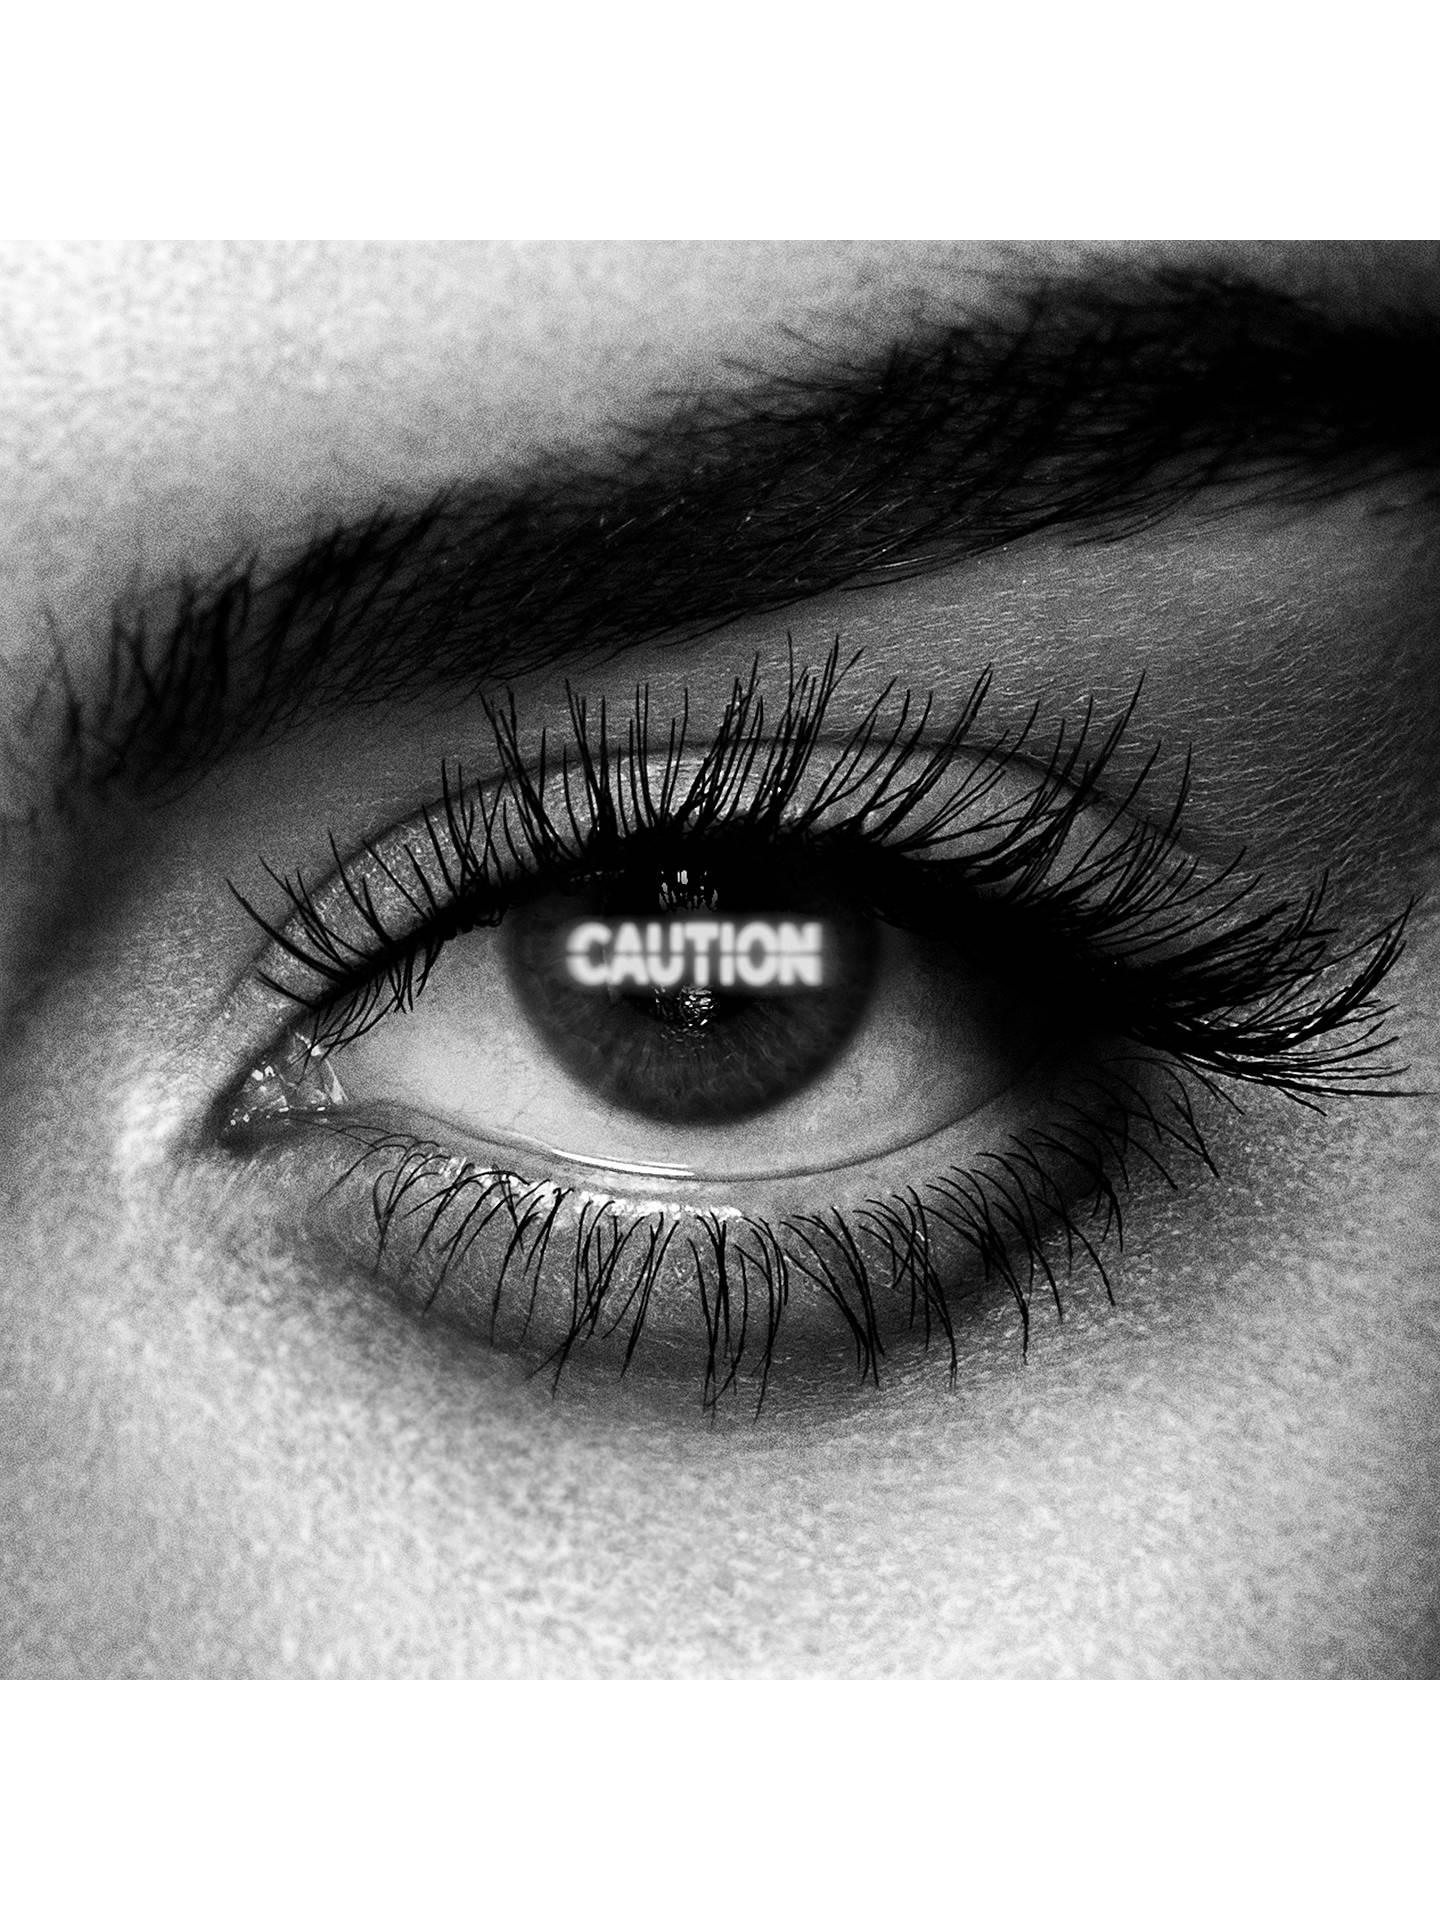 d706a3ce32a ... Buy Hourglass Caution Extreme Lash Mascara, Black Online at  johnlewis.com